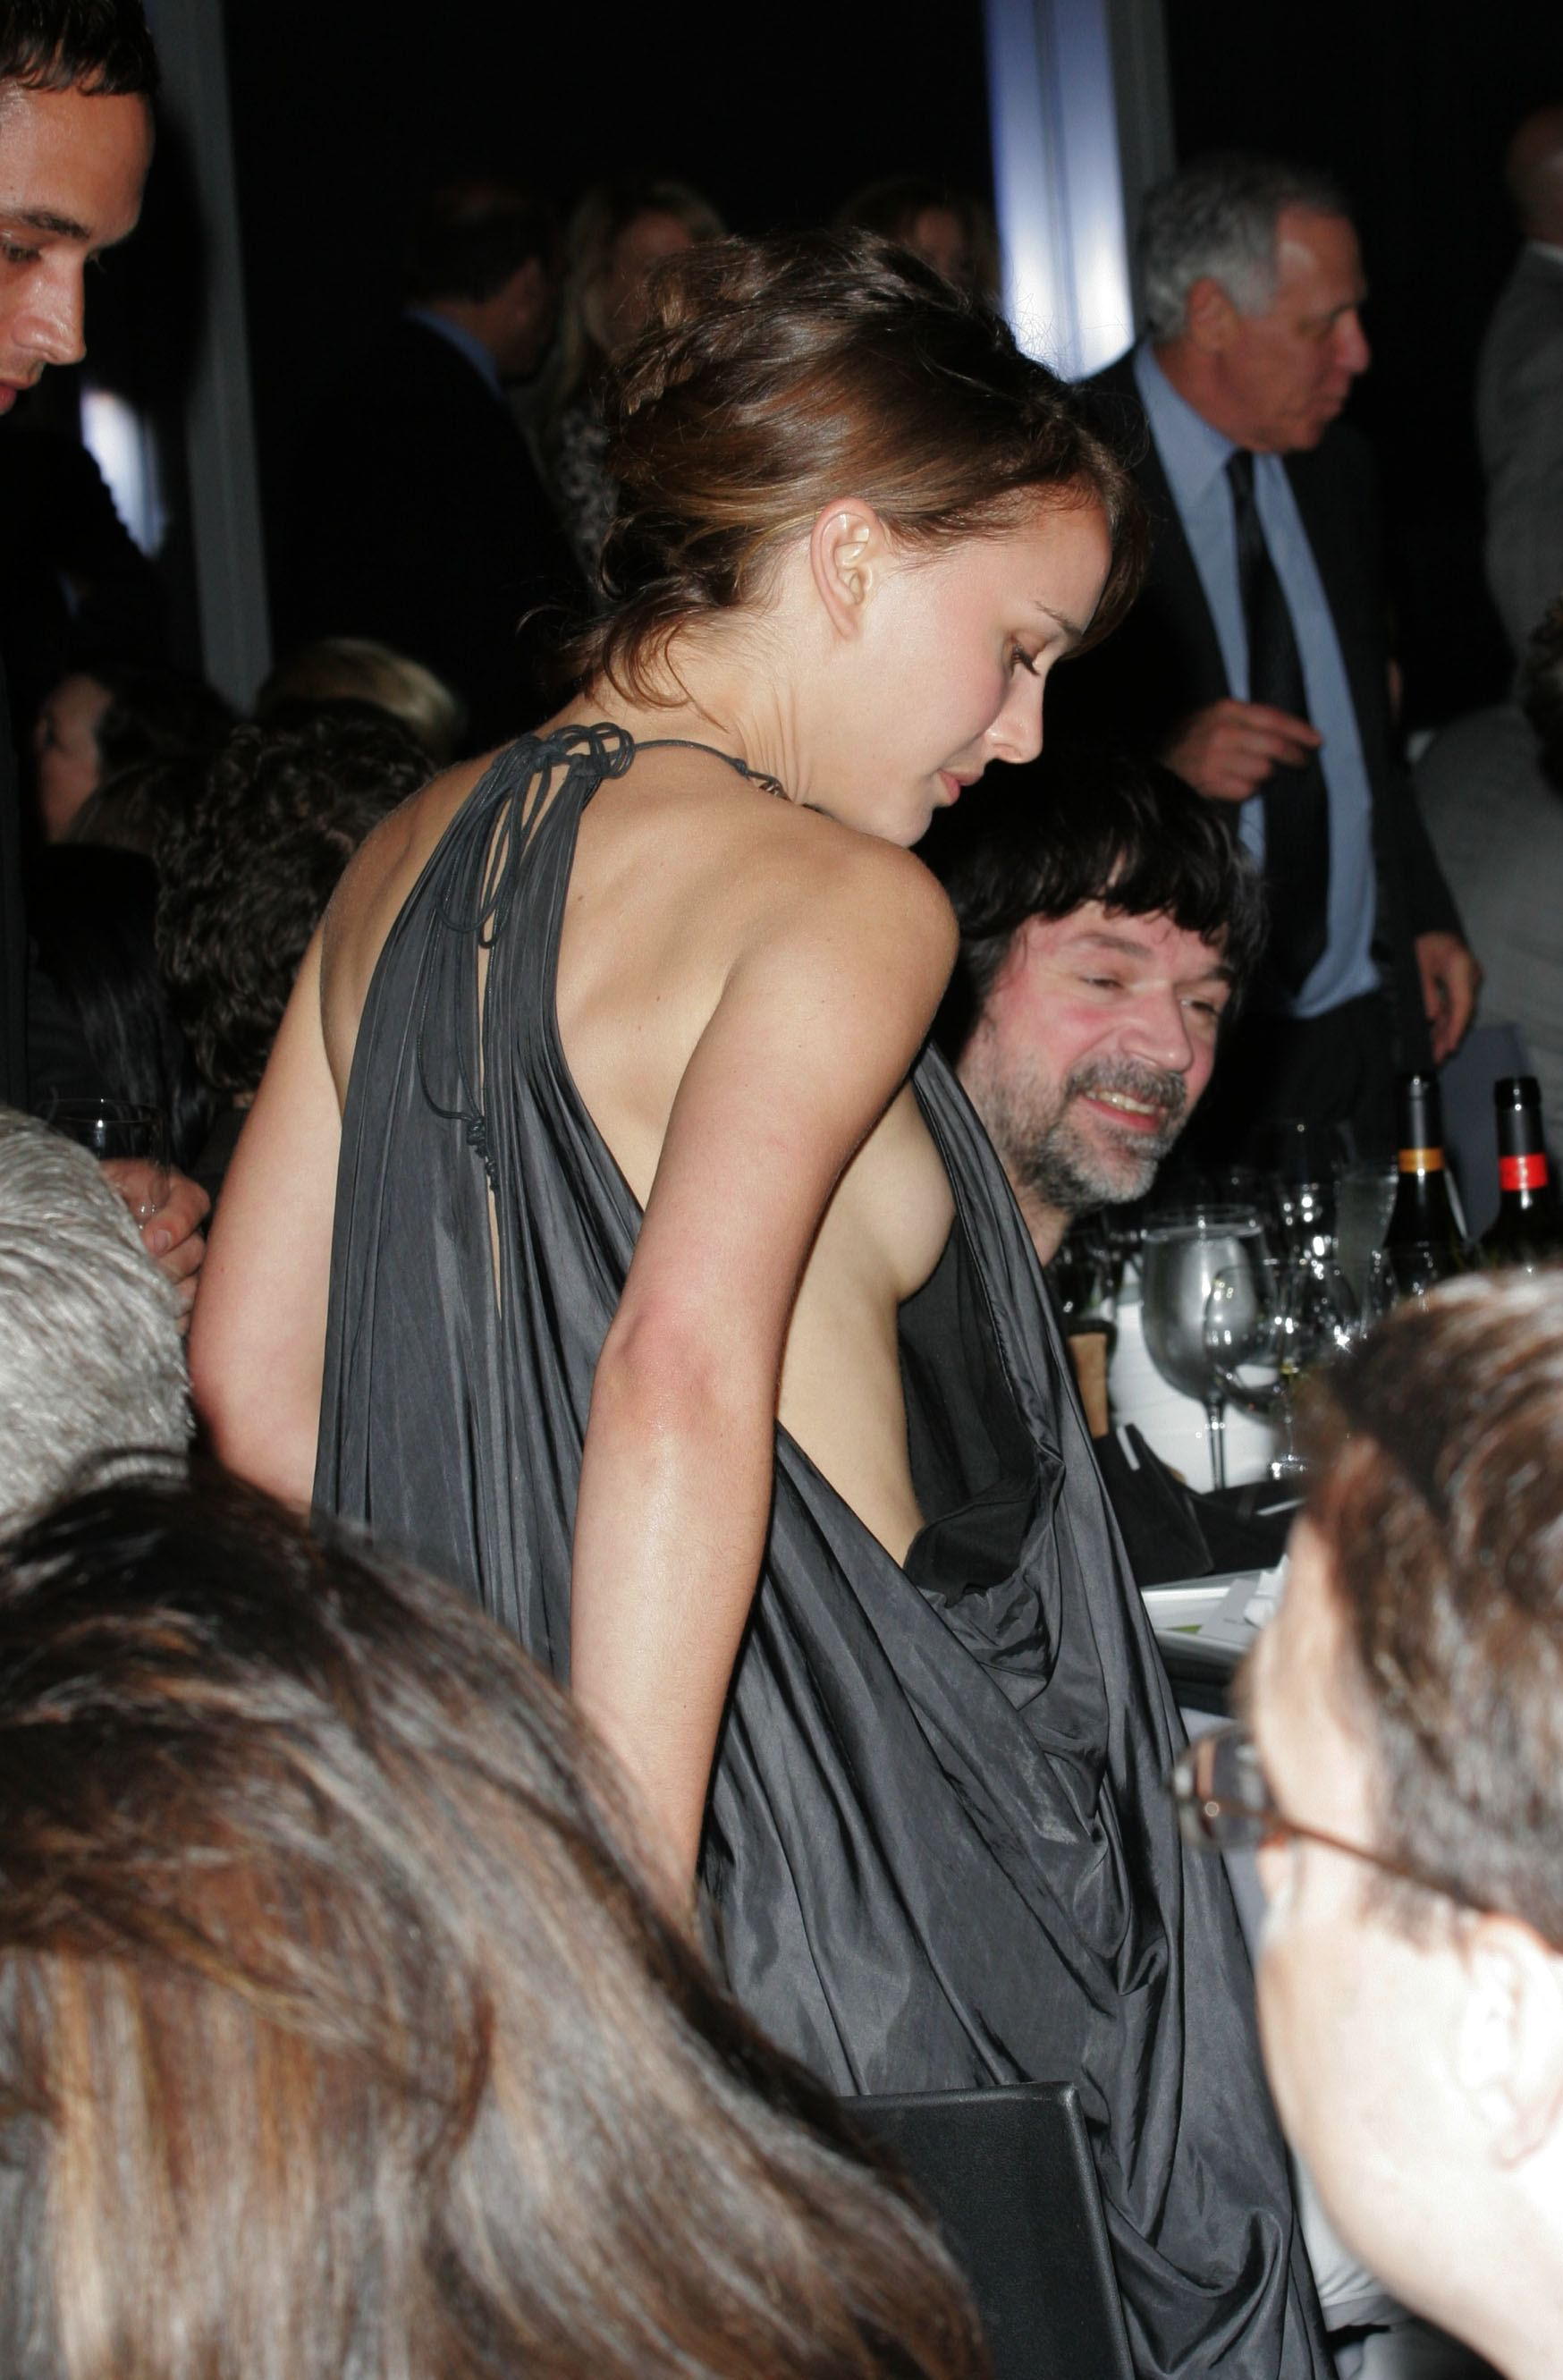 Natalie Portman Nipslip